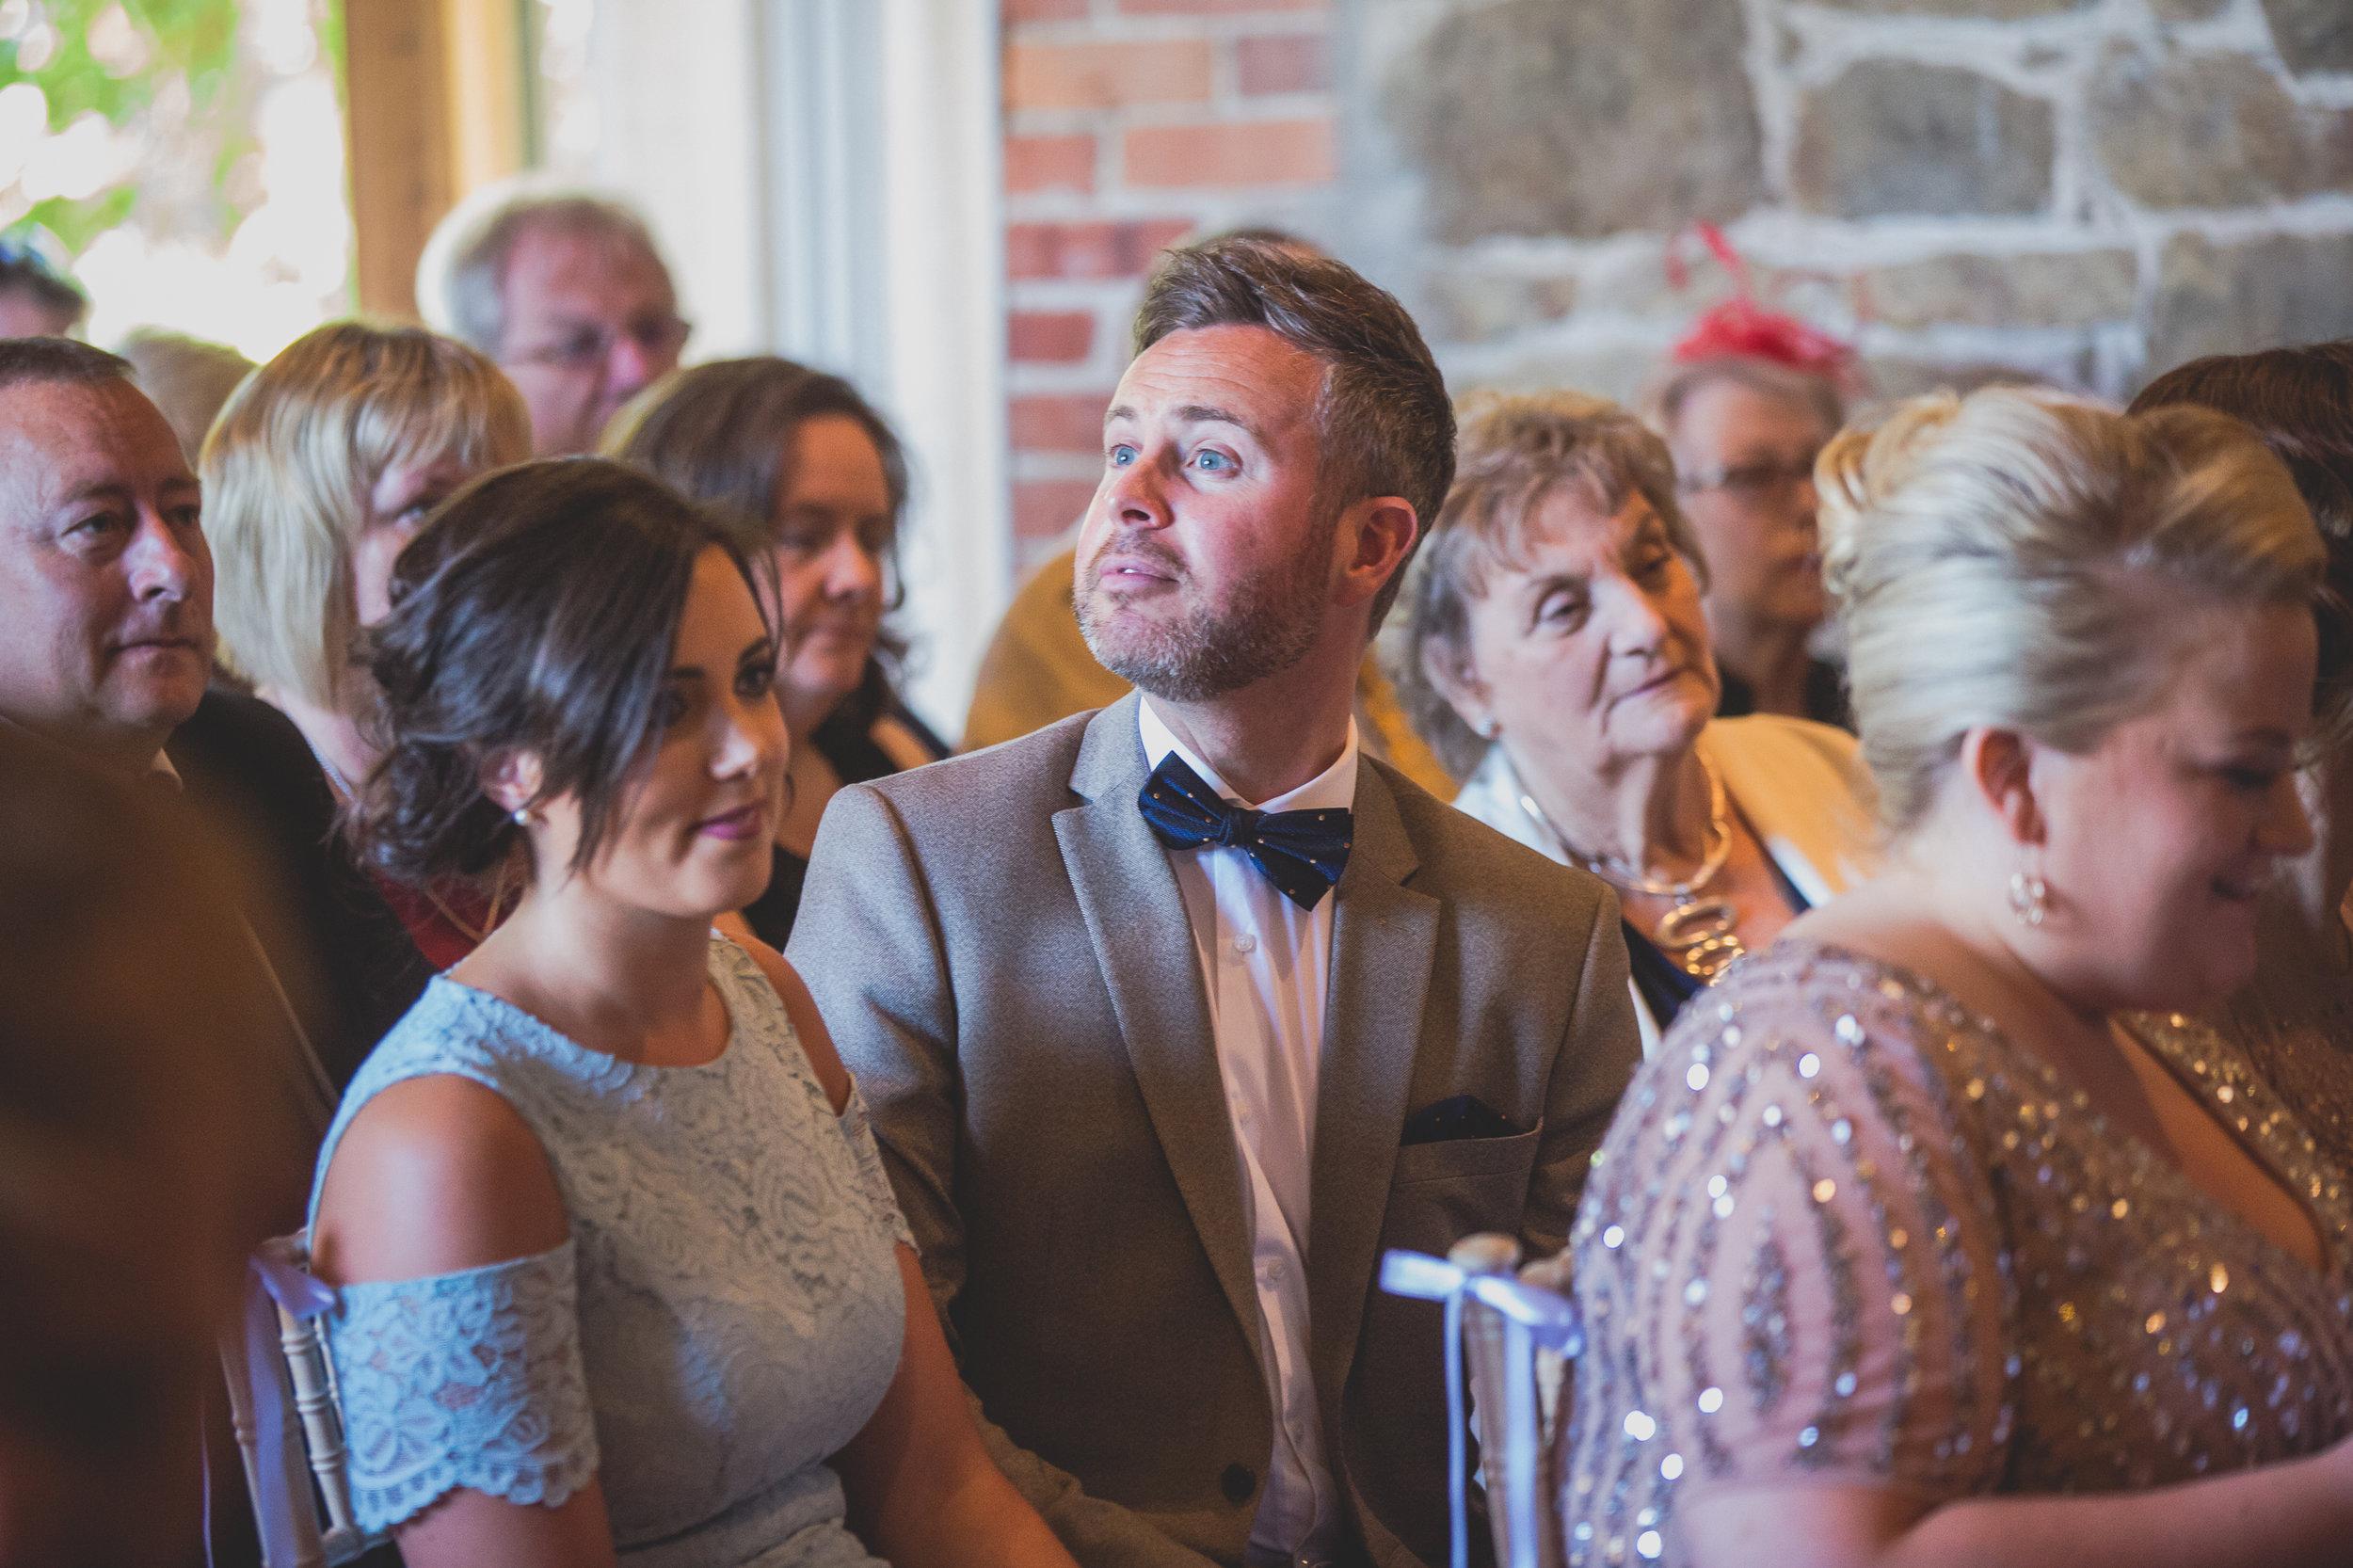 Grittenham Barn female wedding photographers west sussex petworth social-65.jpg